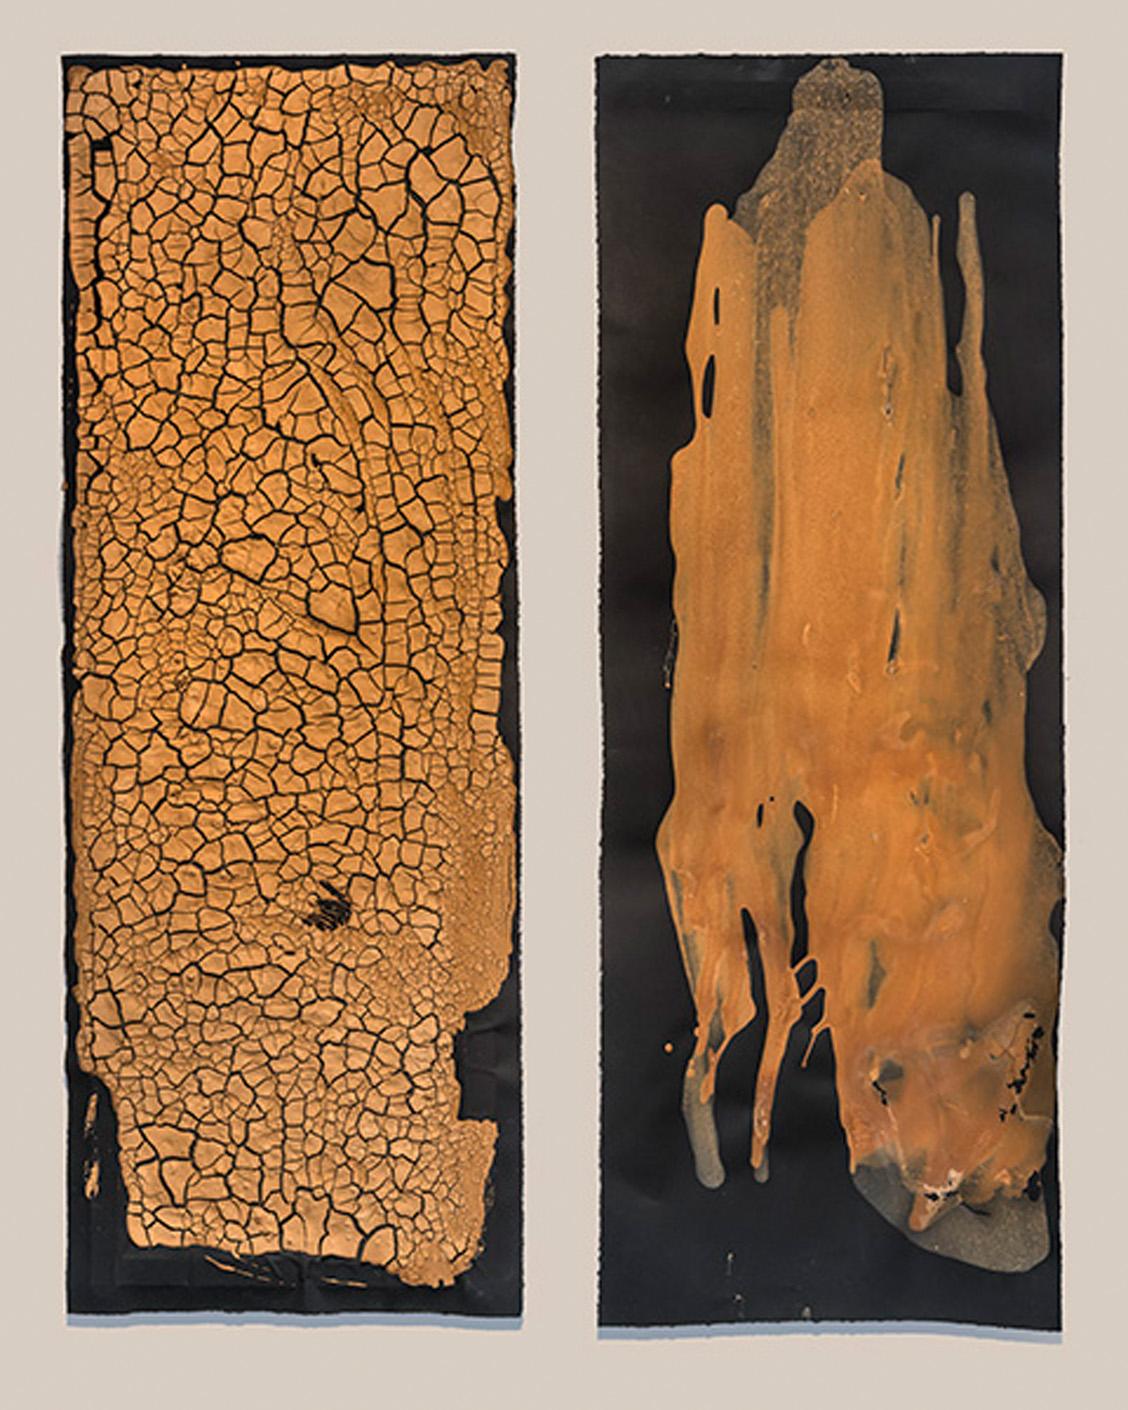 "Dyptch:  California/ Colorado   Left -  California , 2015, egg tempera paste with found earth pigments, 63 x 23"".  Right -   Colorado , 2015, egg tempera found earth pigments, 63 x 23"""